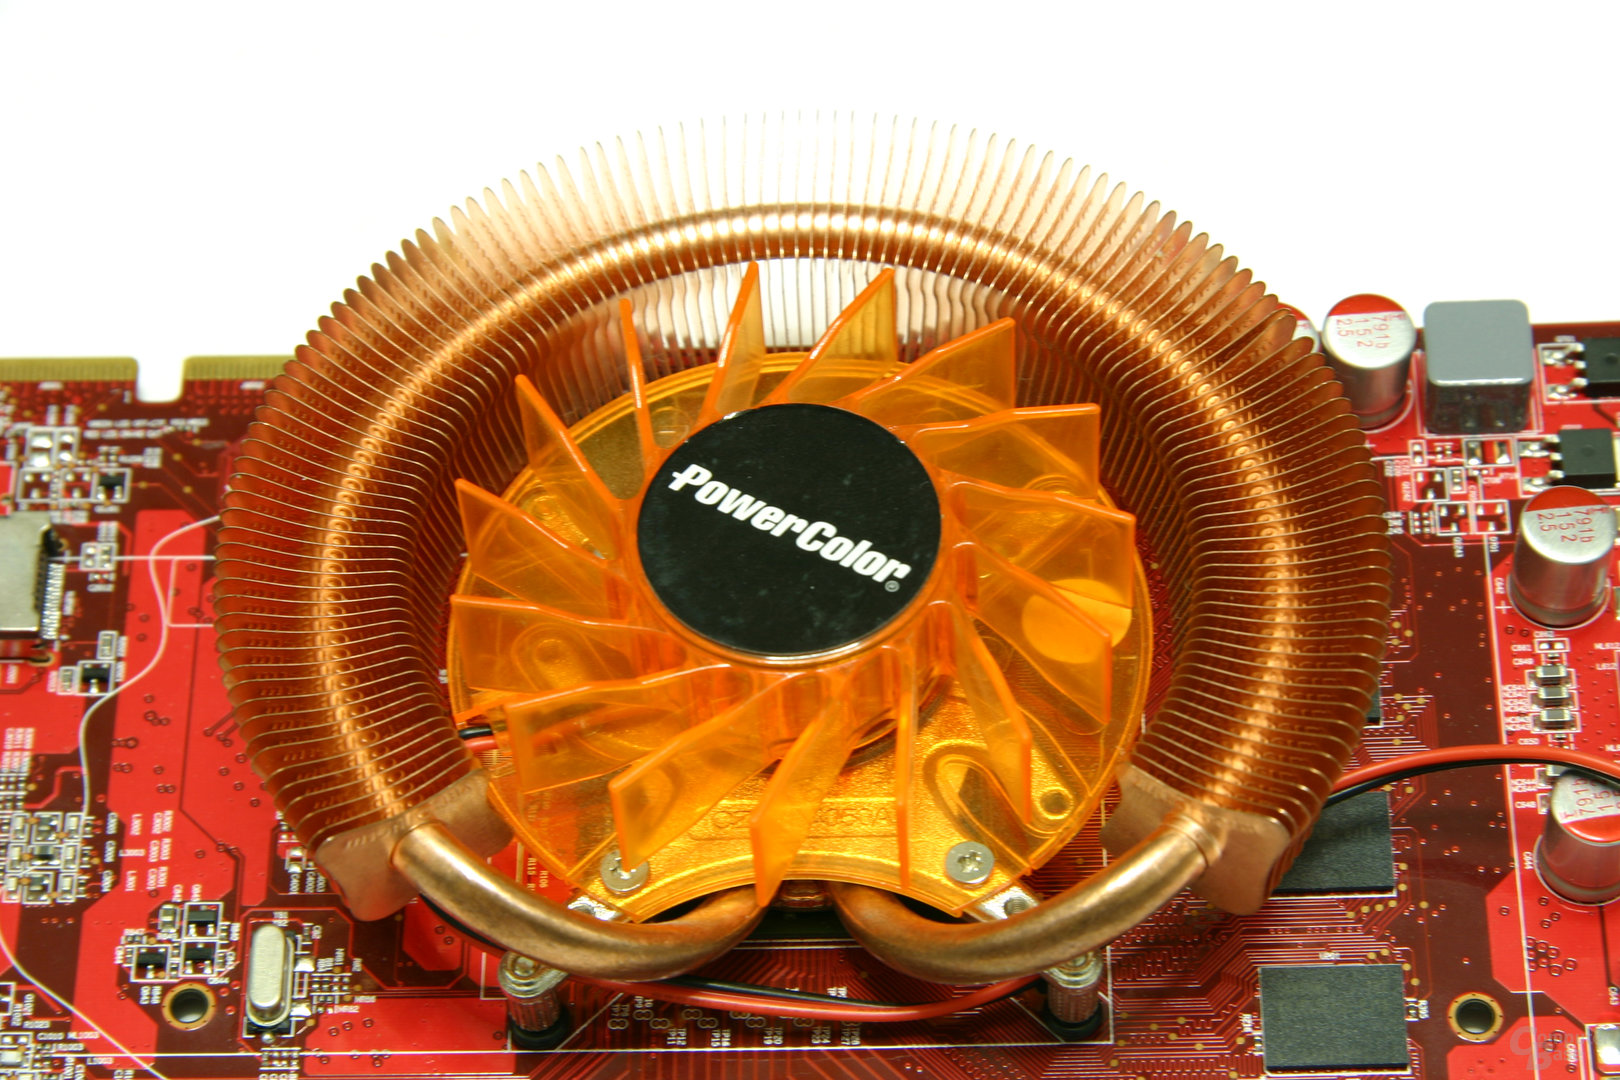 Radeon HD 3850 512 MB Lüfter